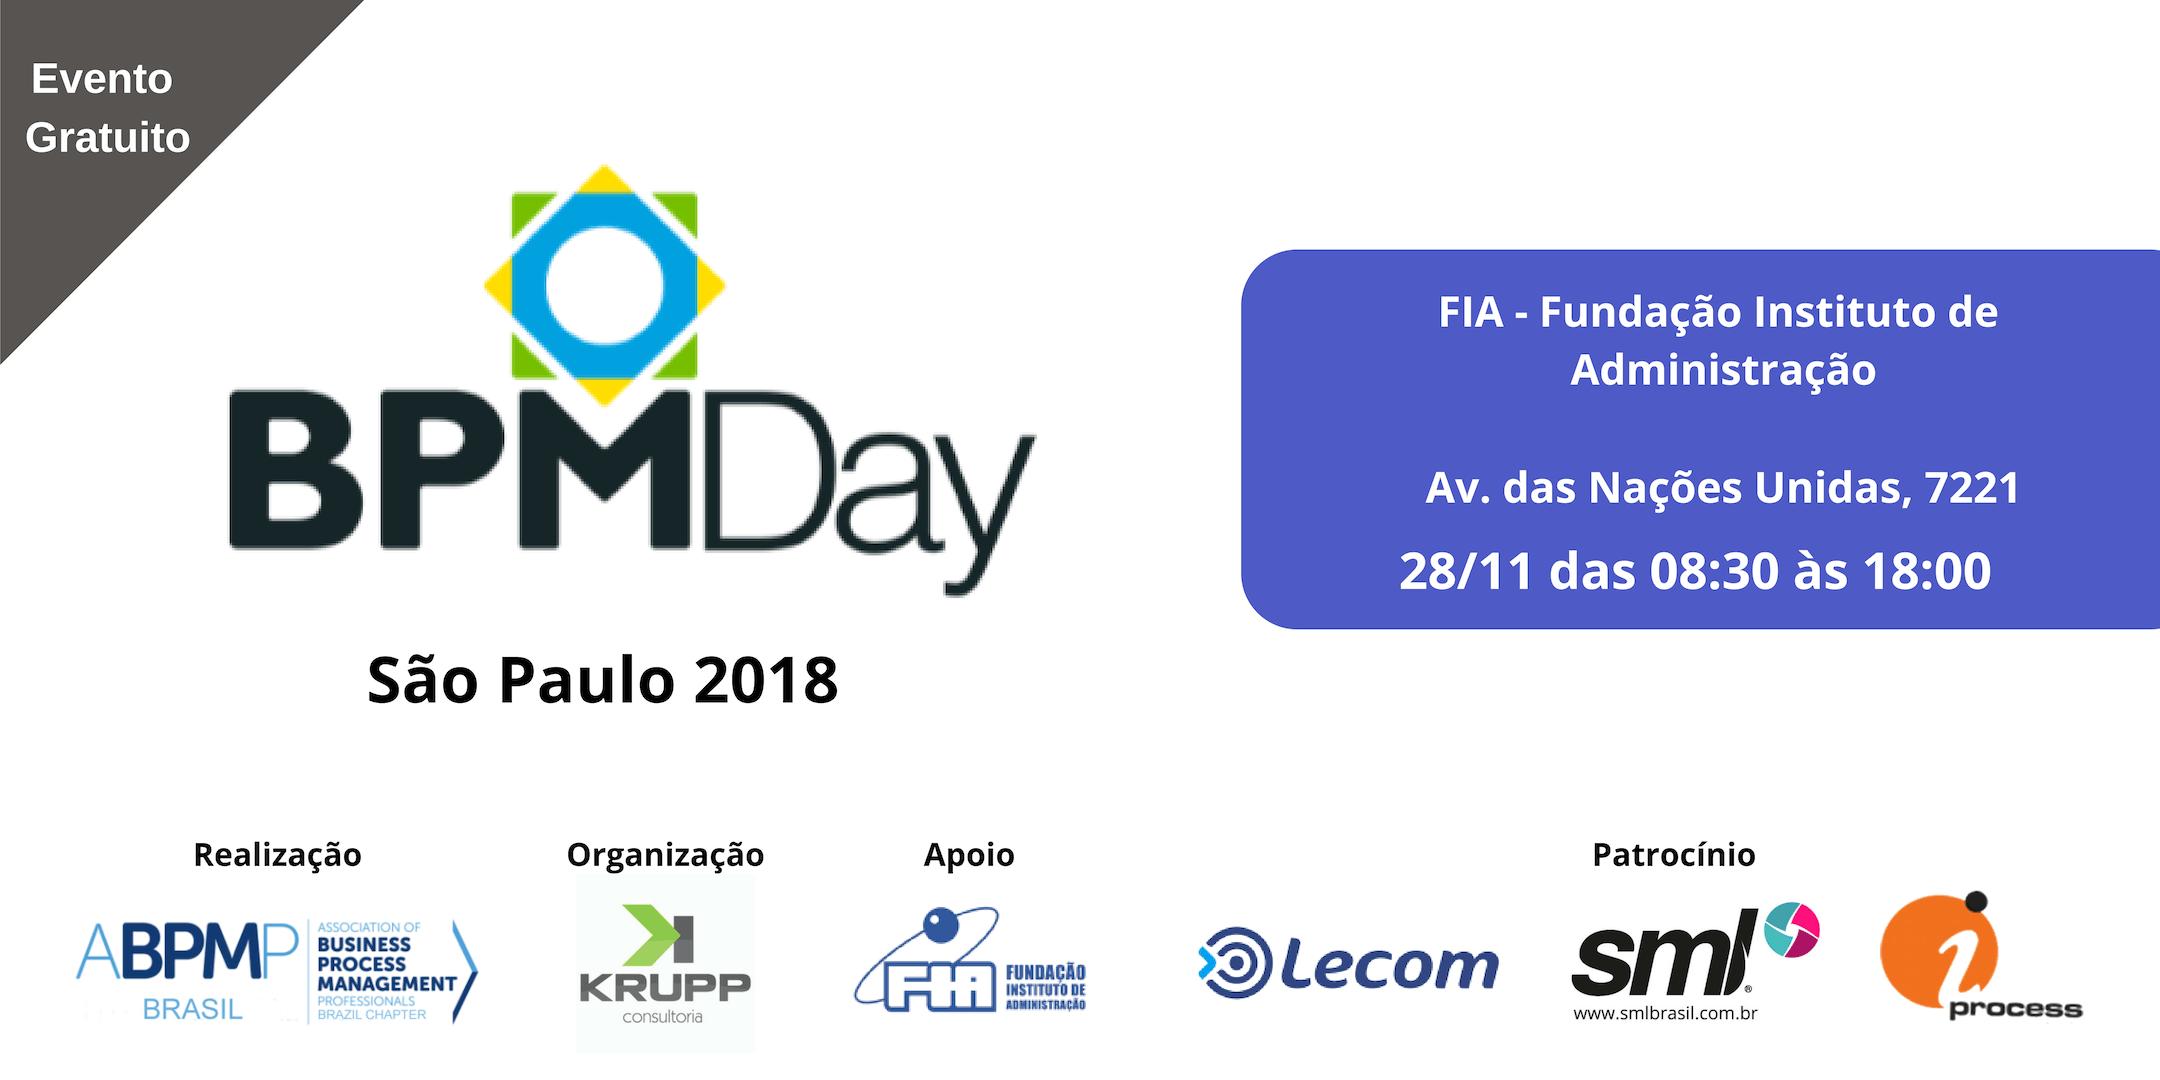 BPM Day São Paulo 2018